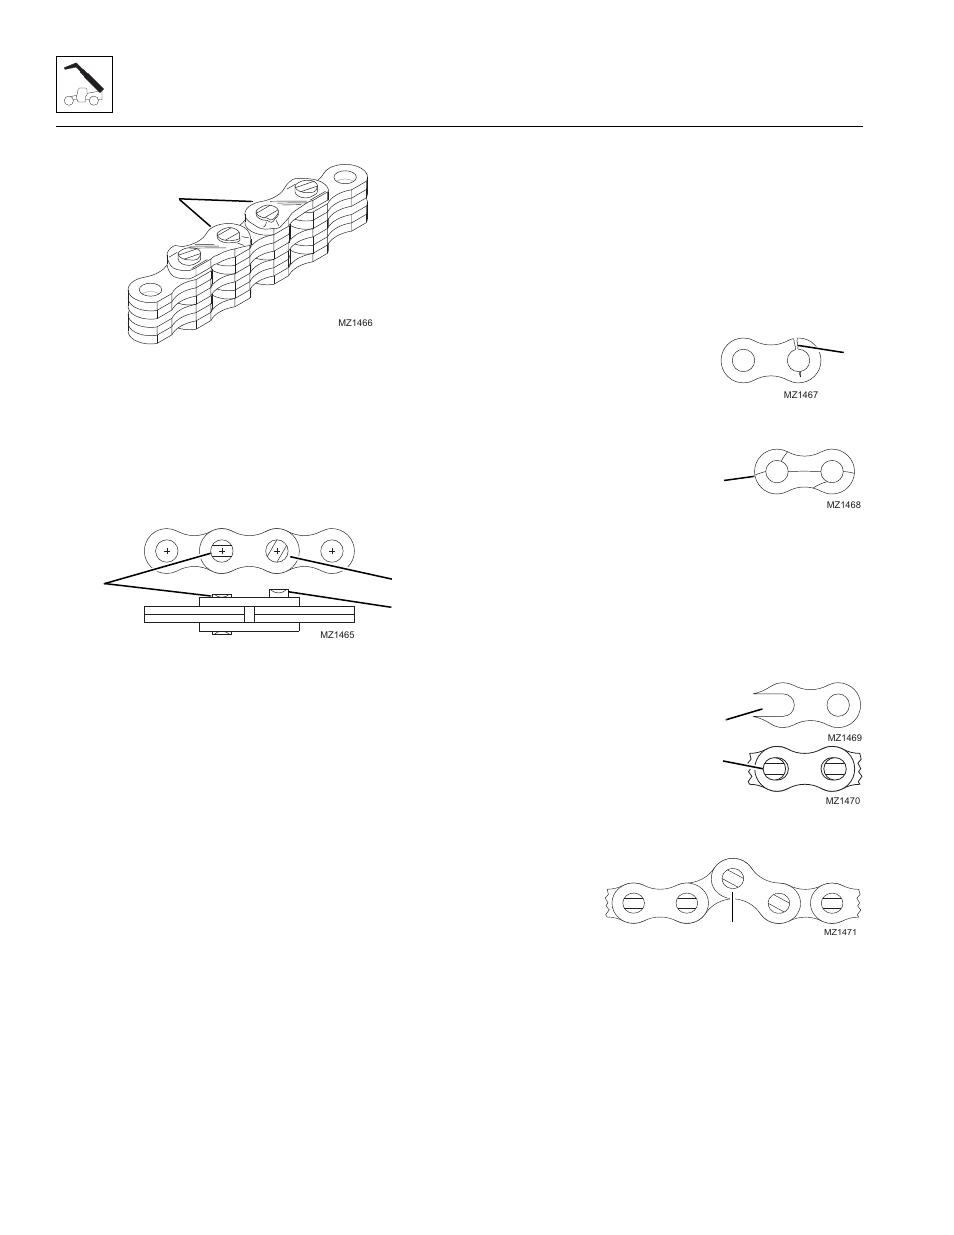 Skytrak 8042 Service Manual User Manual